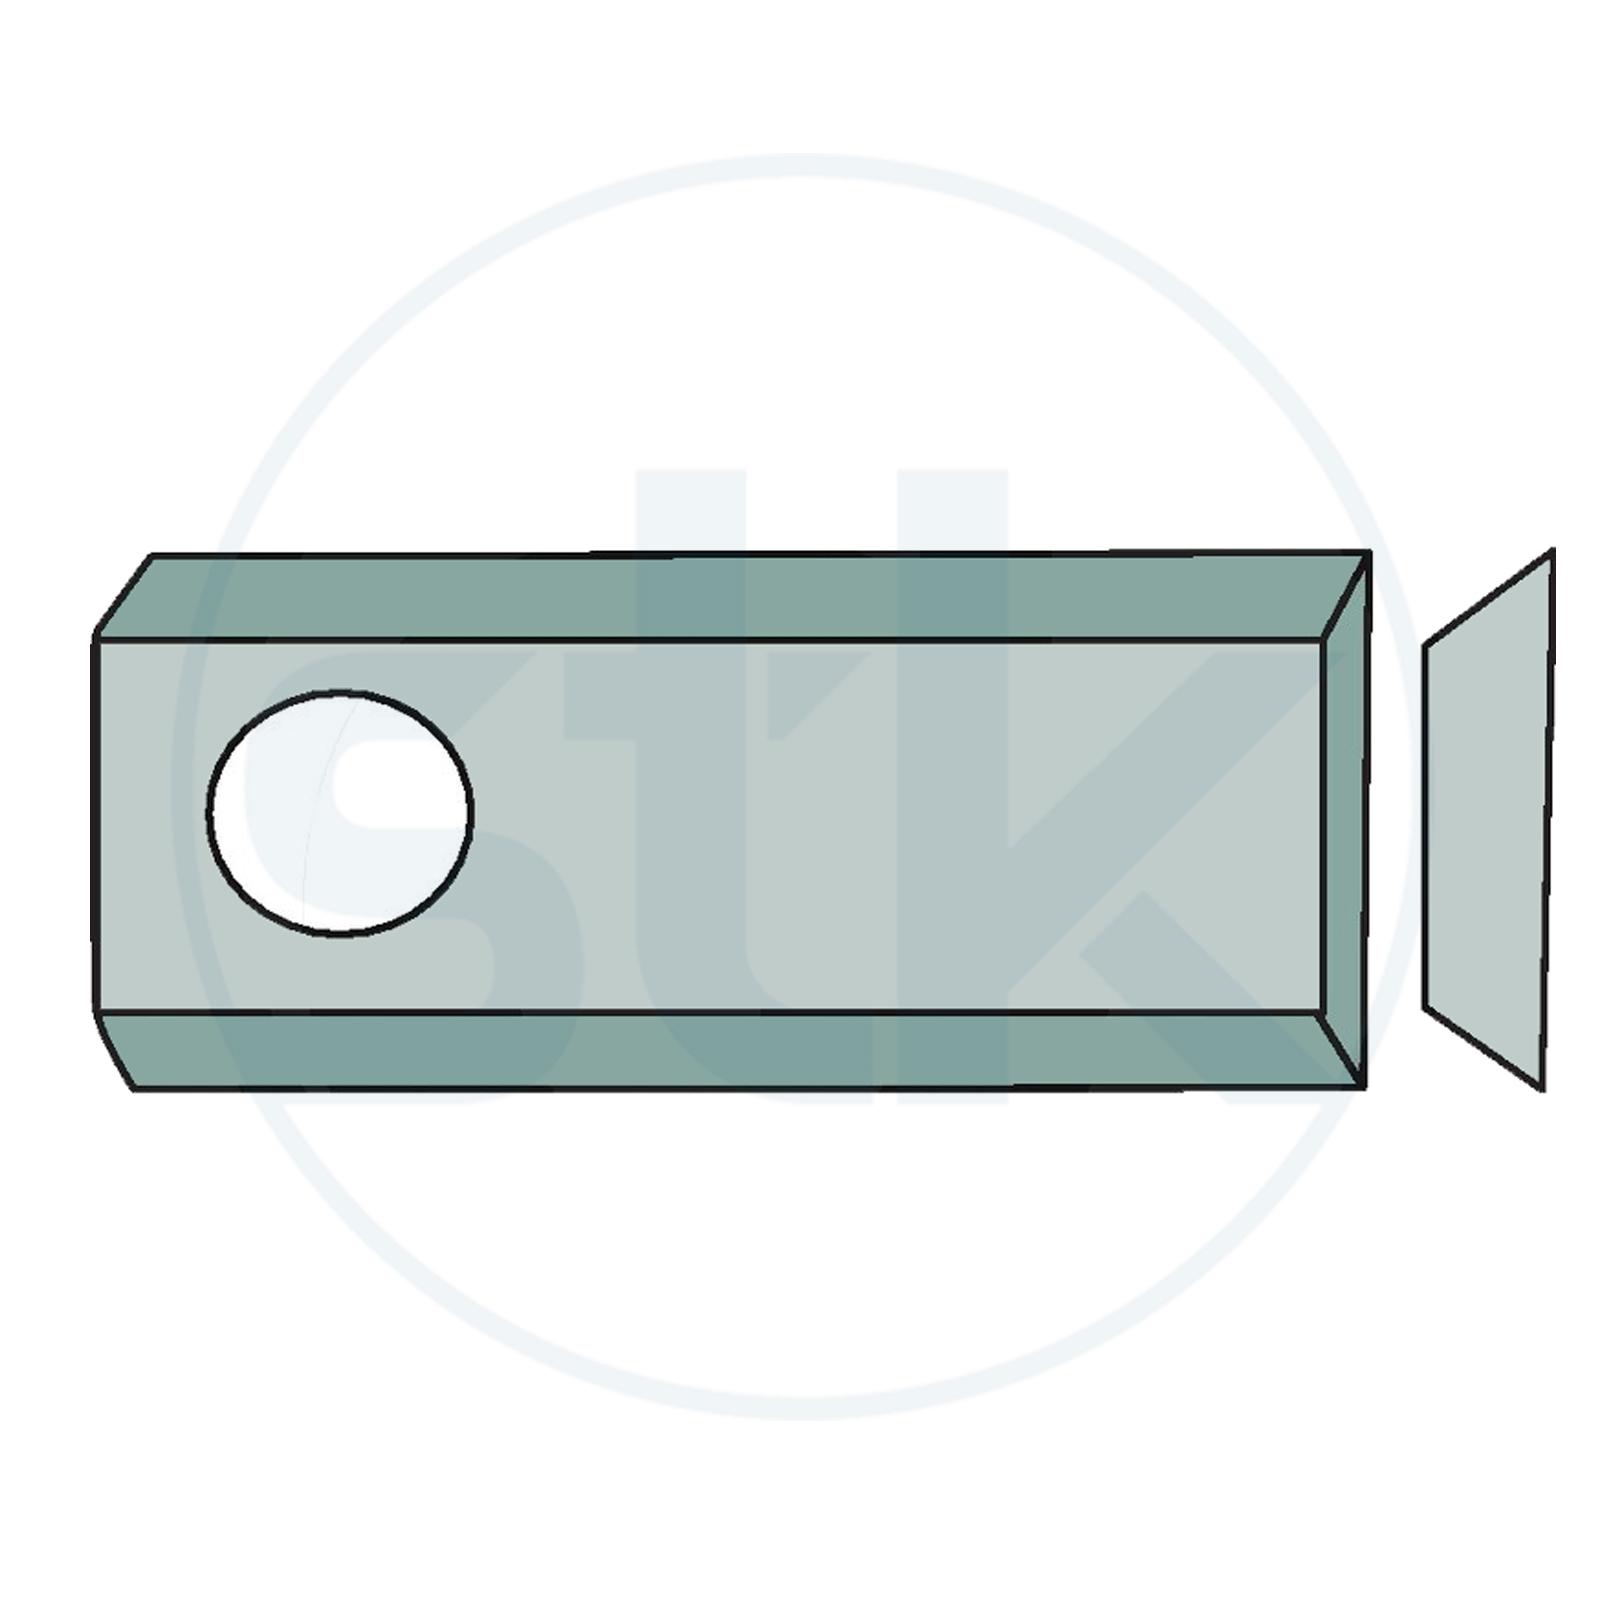 Granit Klinken Mähmesser Deutz Fahr Kreiselmäher Kreiselmähwerk 96x40x3